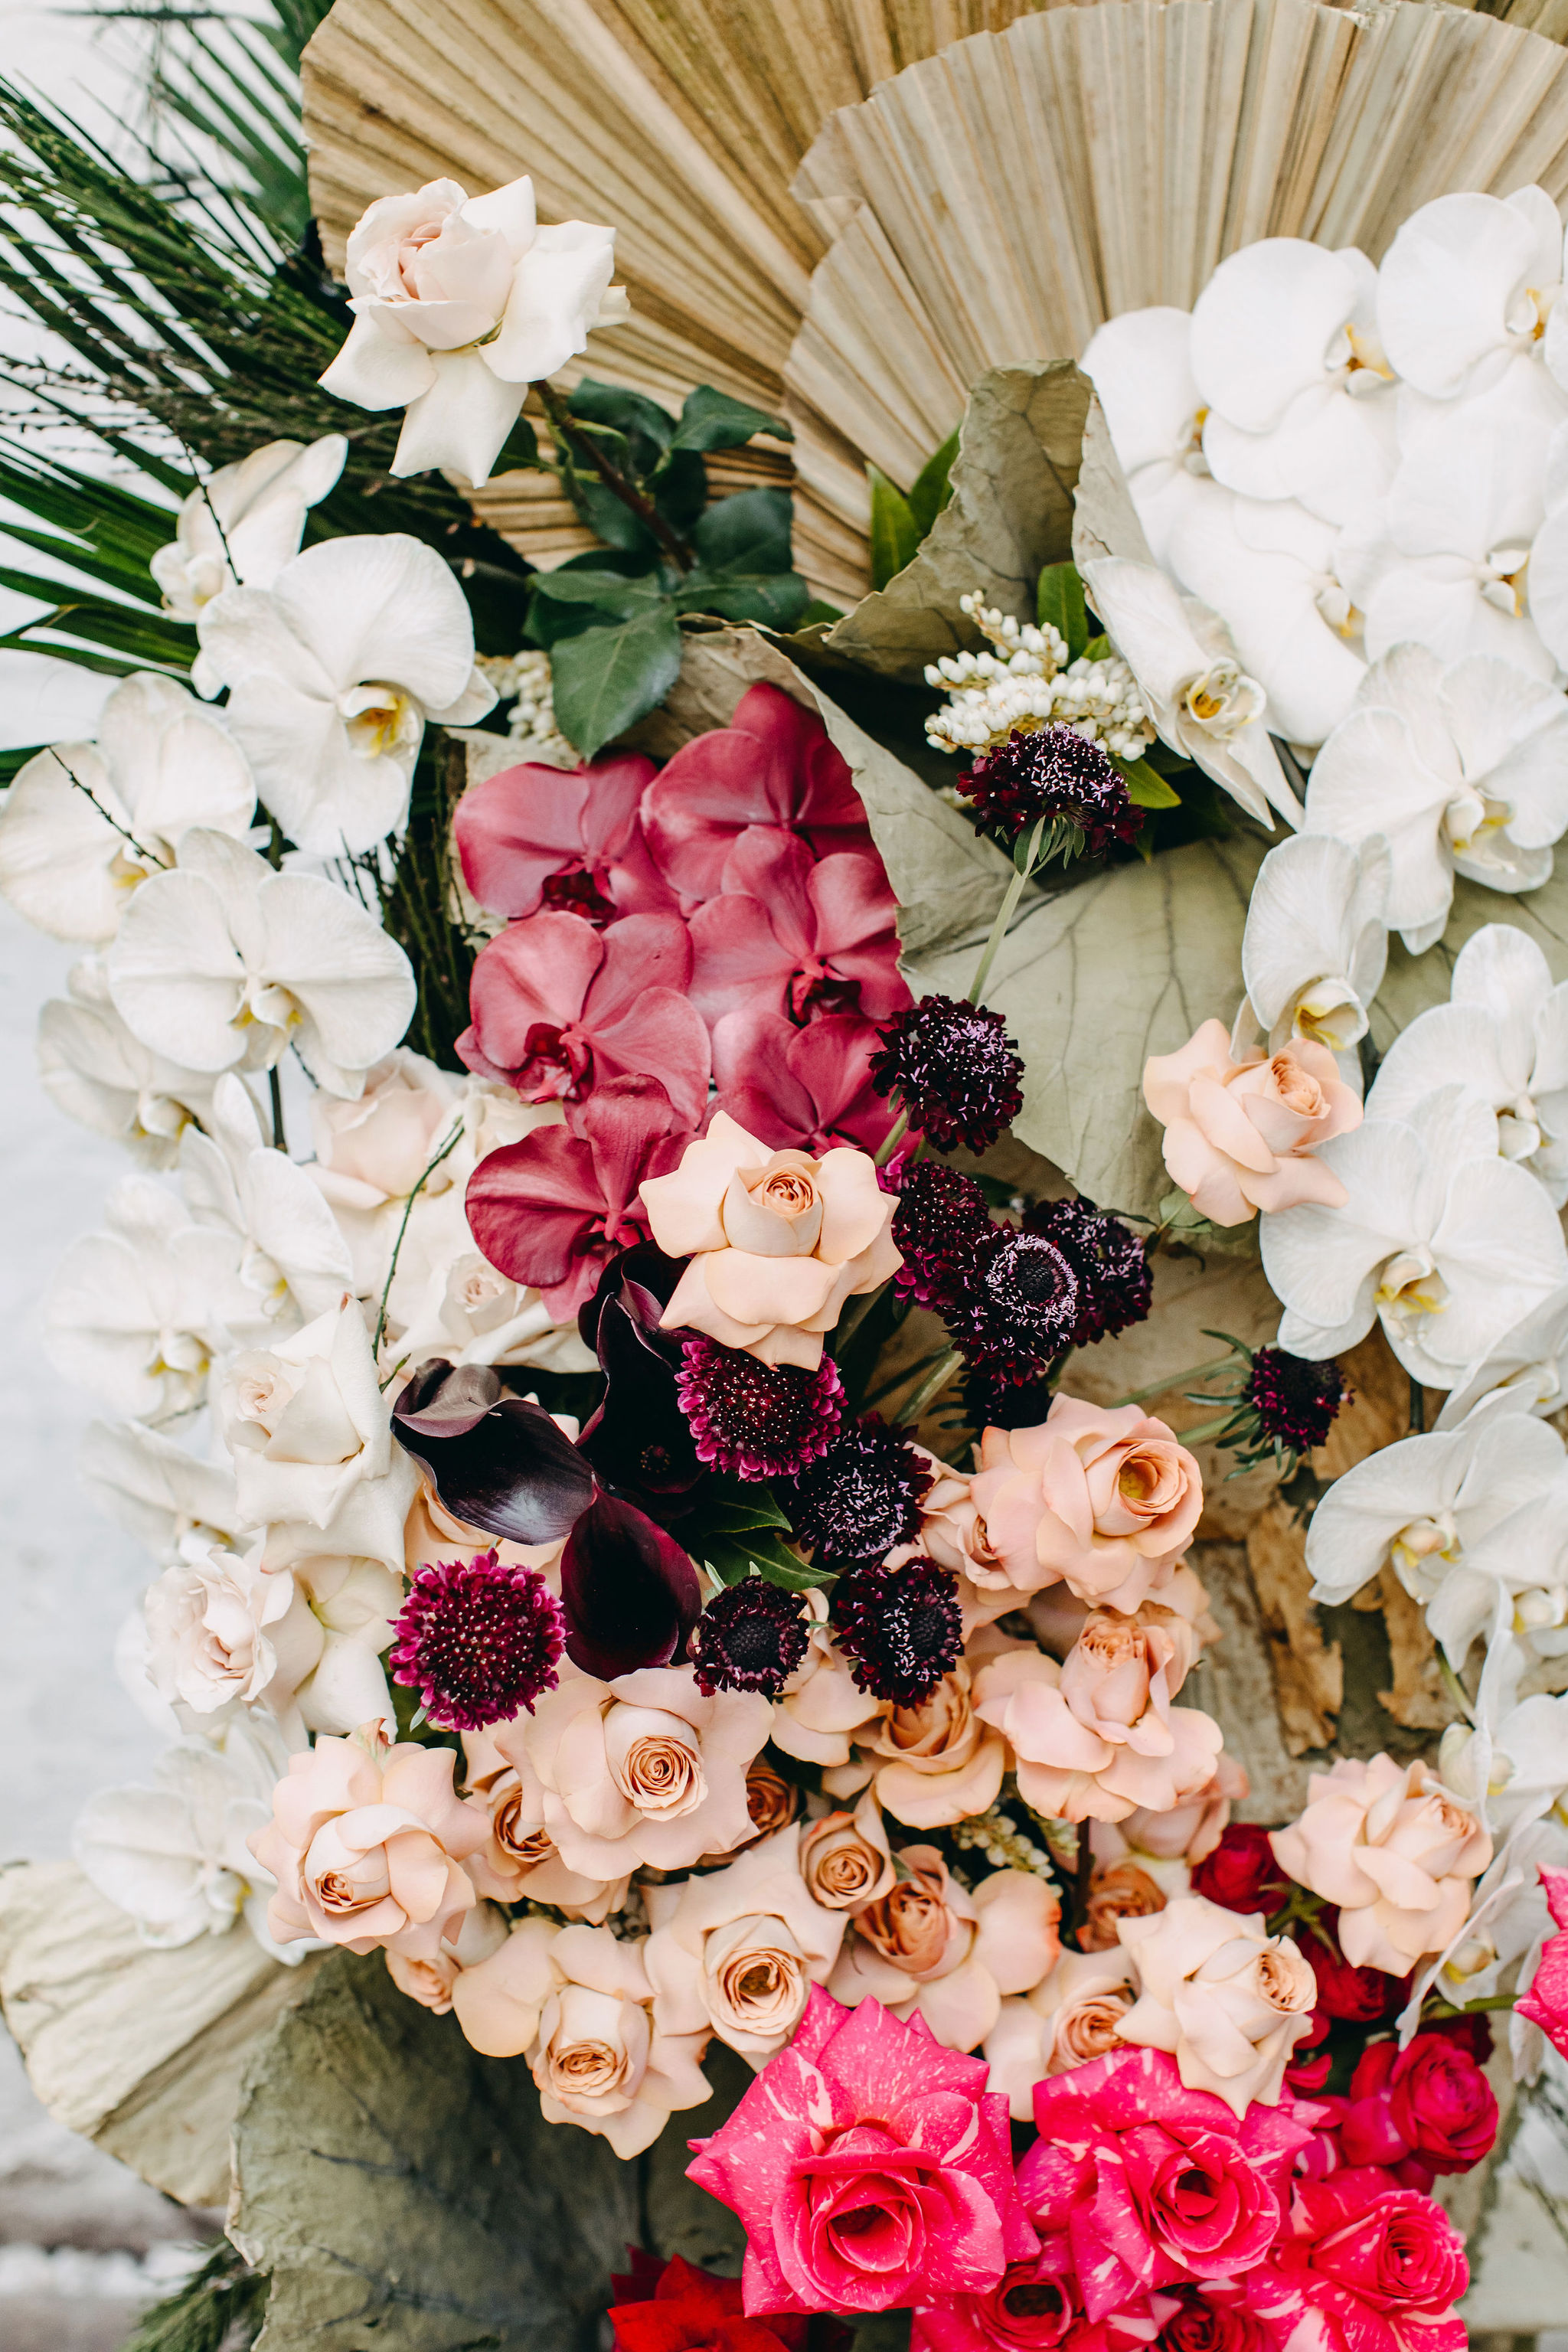 19-FOX&RABBIT-WEDDING-STATEBUILDINGS-26OCT2019